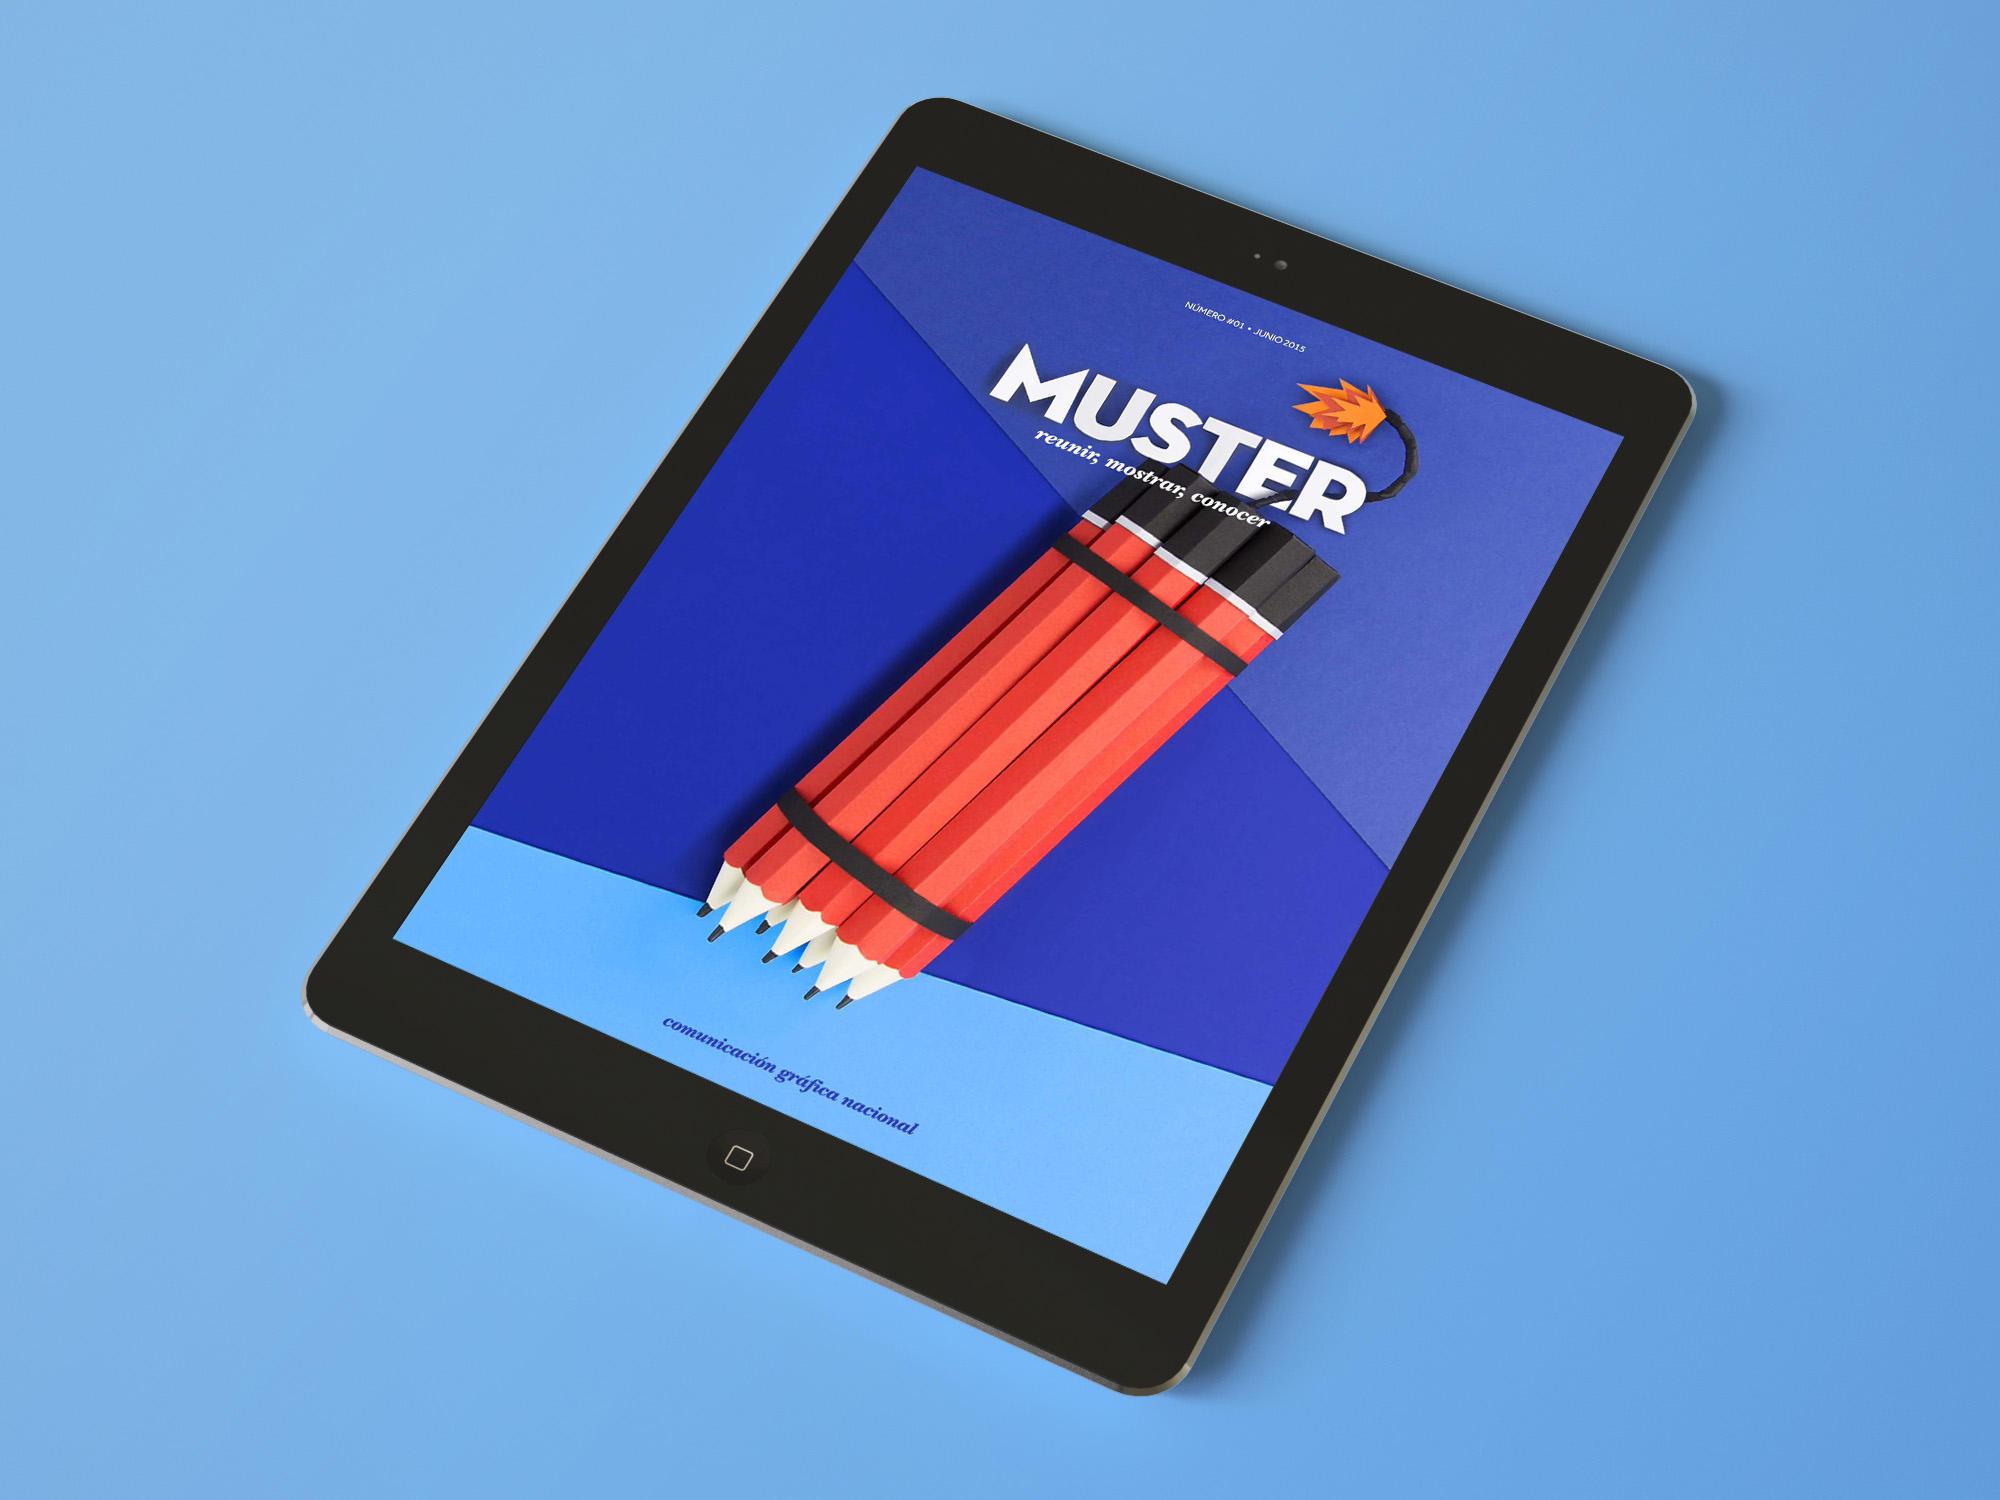 muster revista digital diseno 4